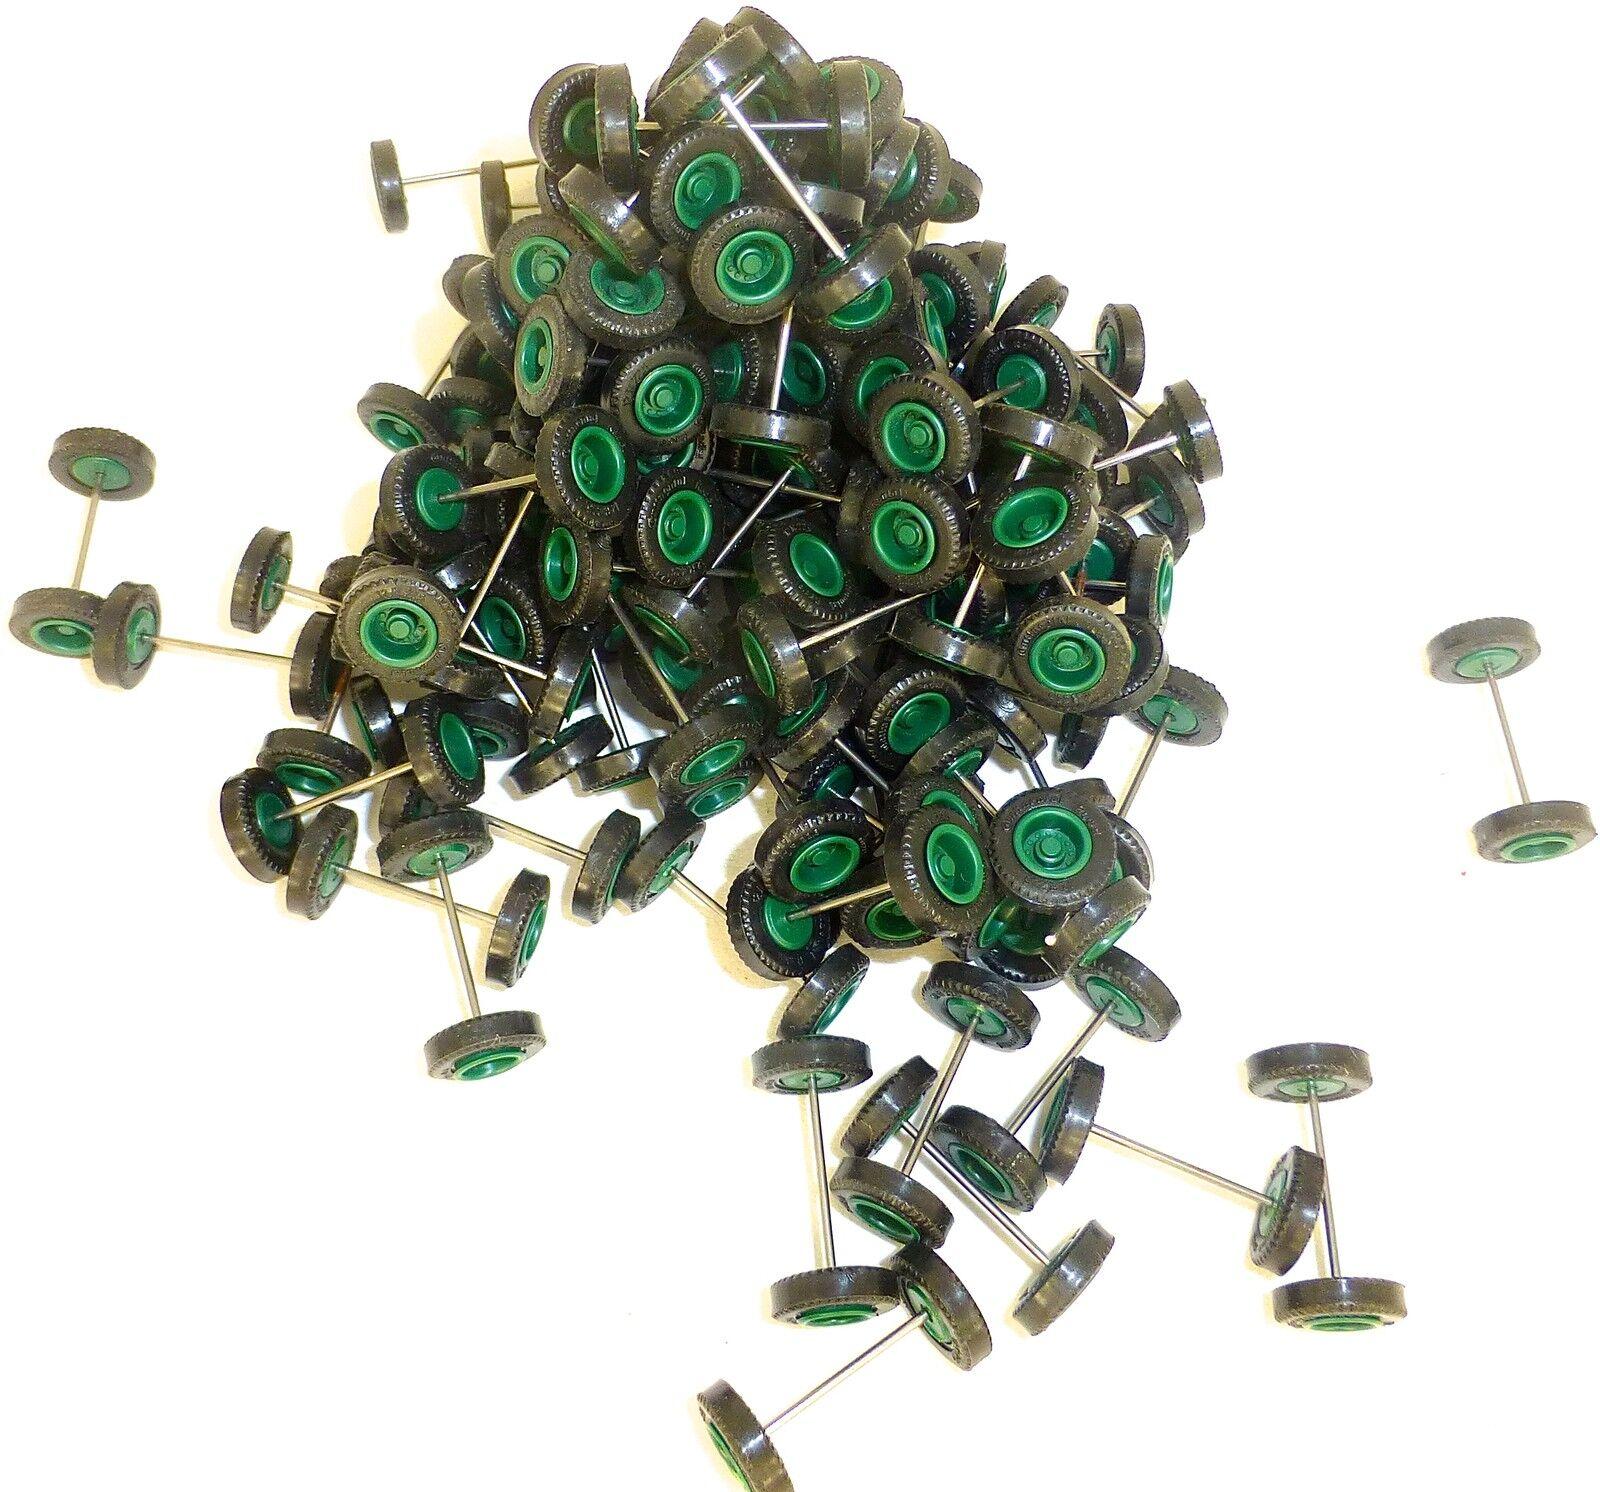 100 x Radsatz ca 26mm Achsbreite Felge green  Herpa Albedo 1 87 3801 å